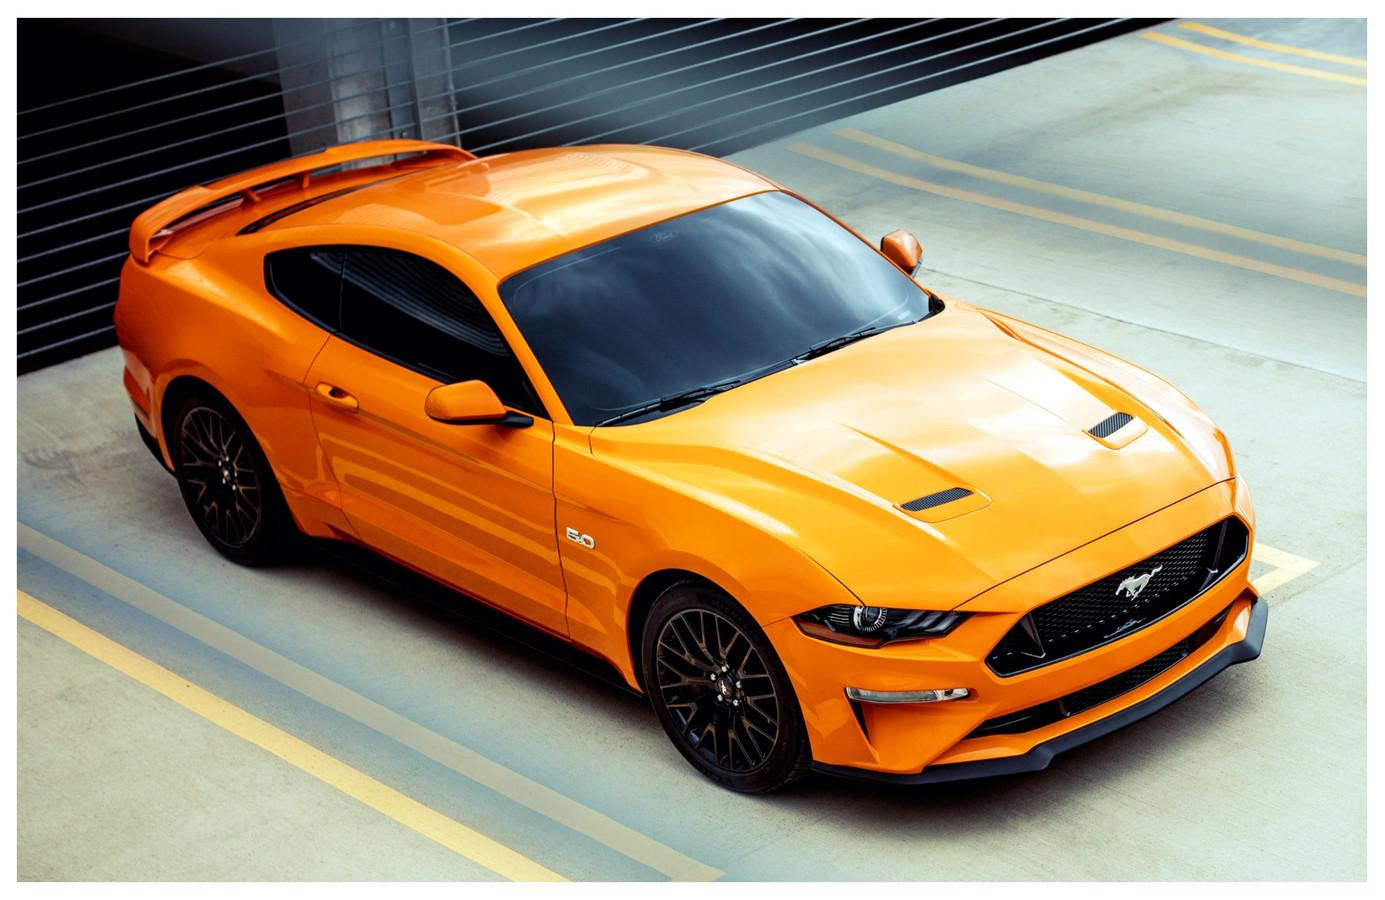 De Ford Mustang 5.0 V8 wordt bijna 20.000 euro goedkoper.